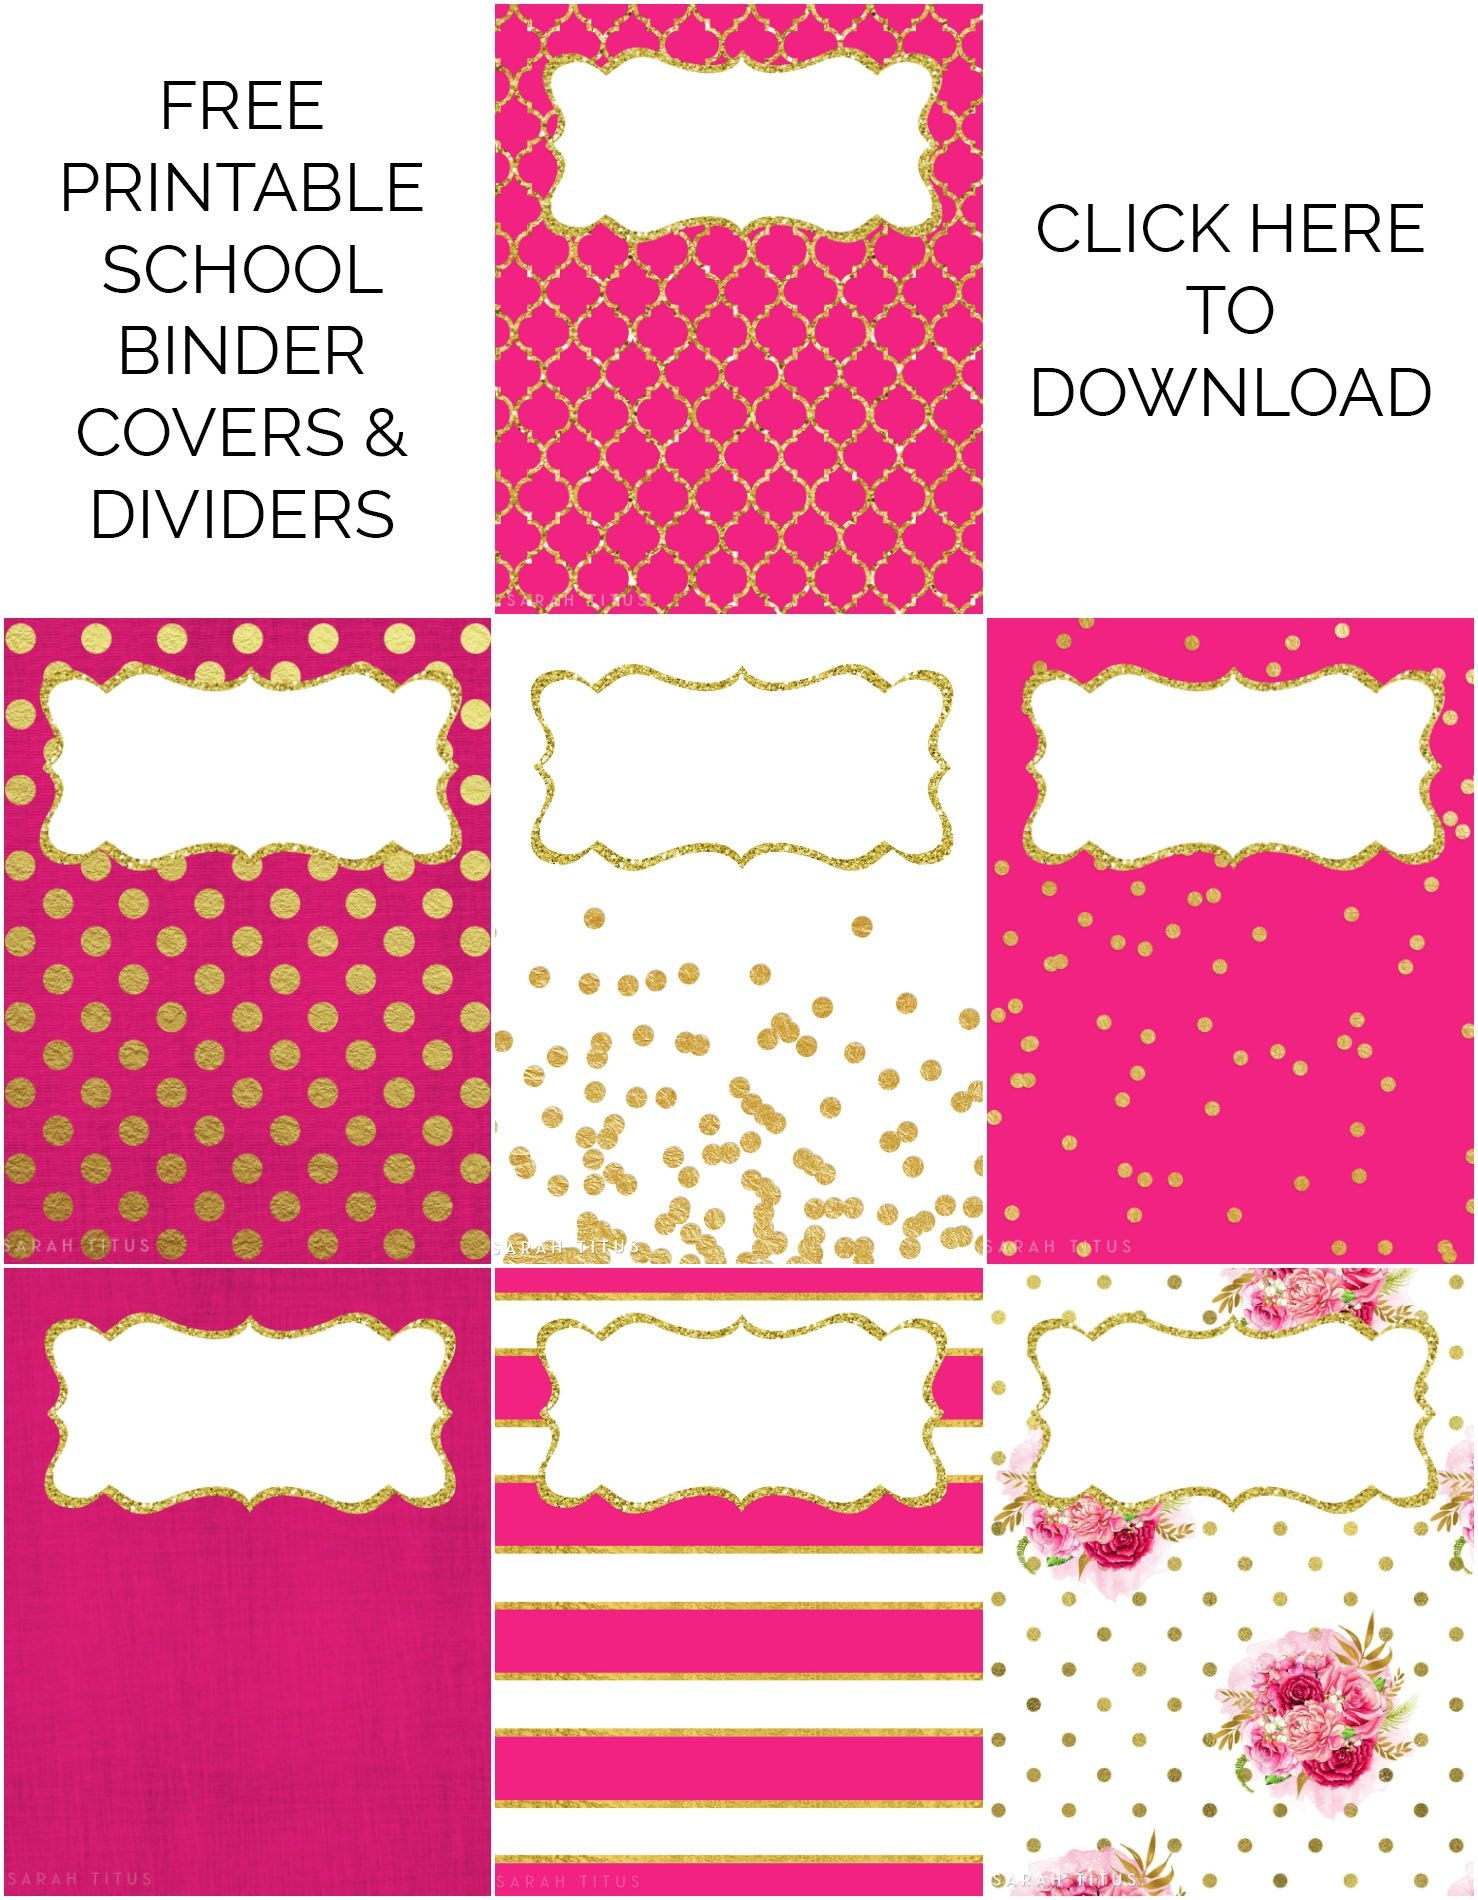 Binder Covers / Dividers Free Printables   Plans   Binder Covers - Free Printable Binder Covers